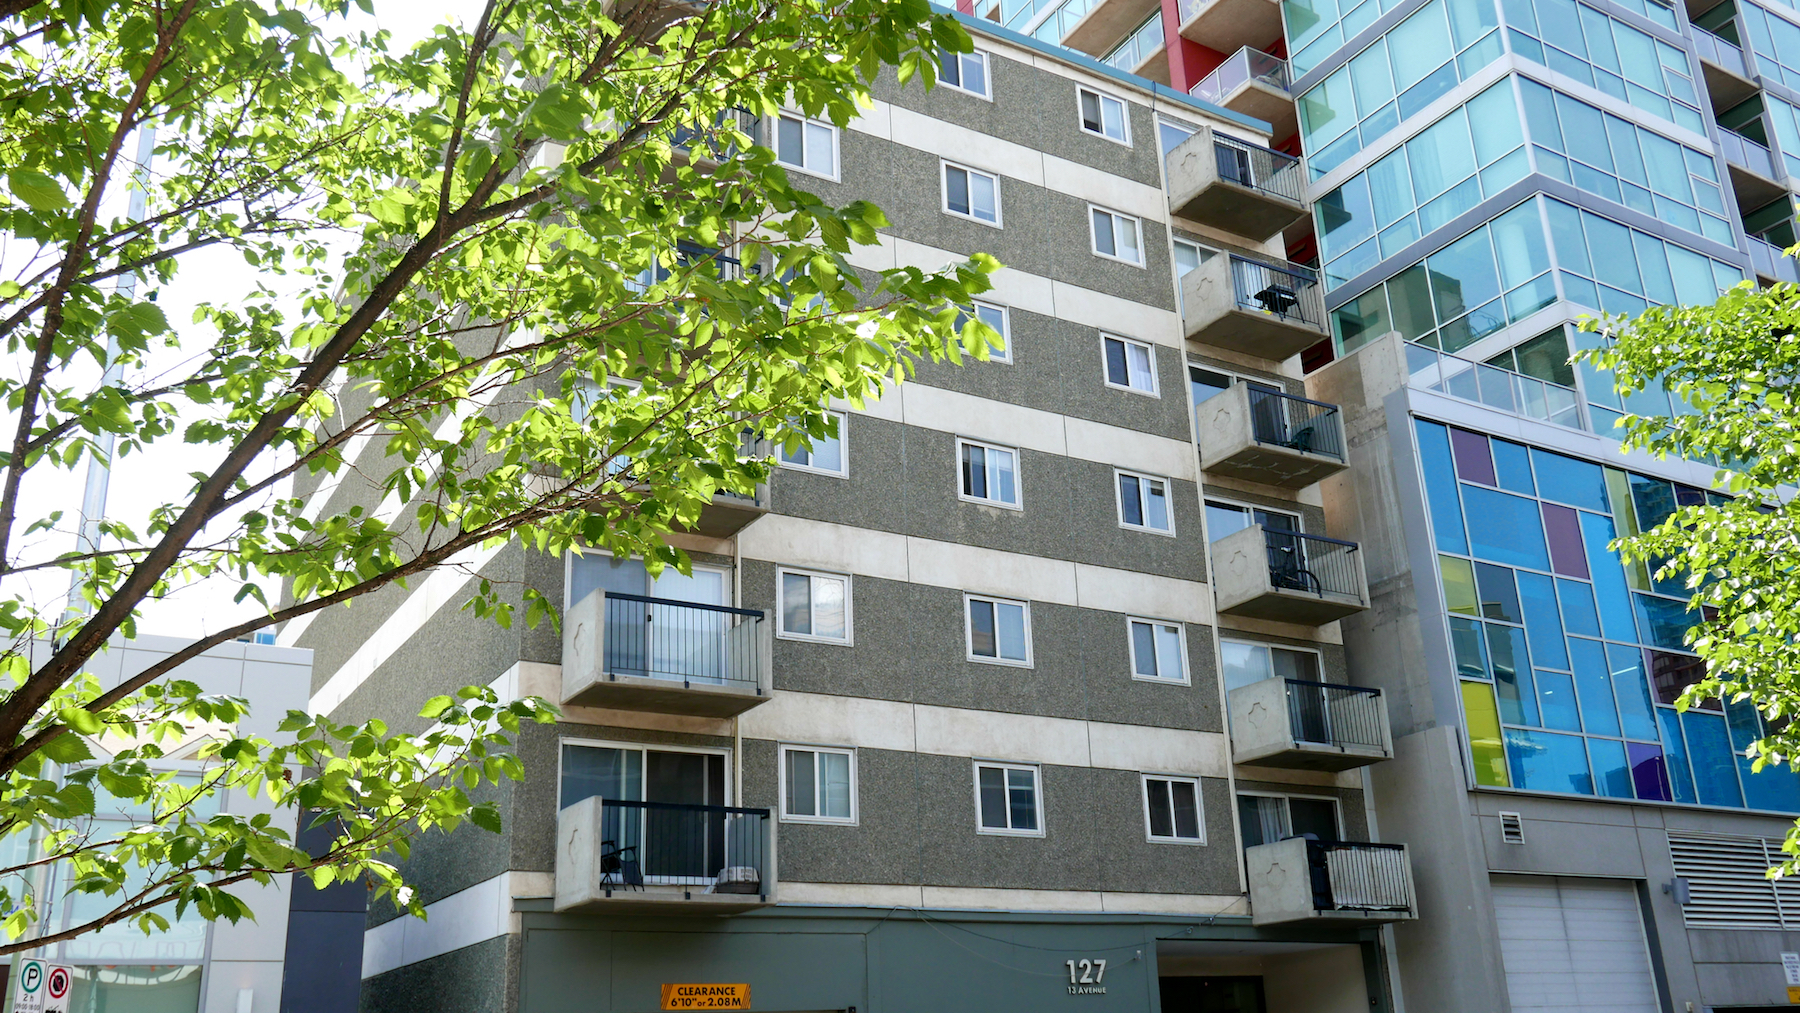 127 13 Ave SW, Calgary, AB - $1,299